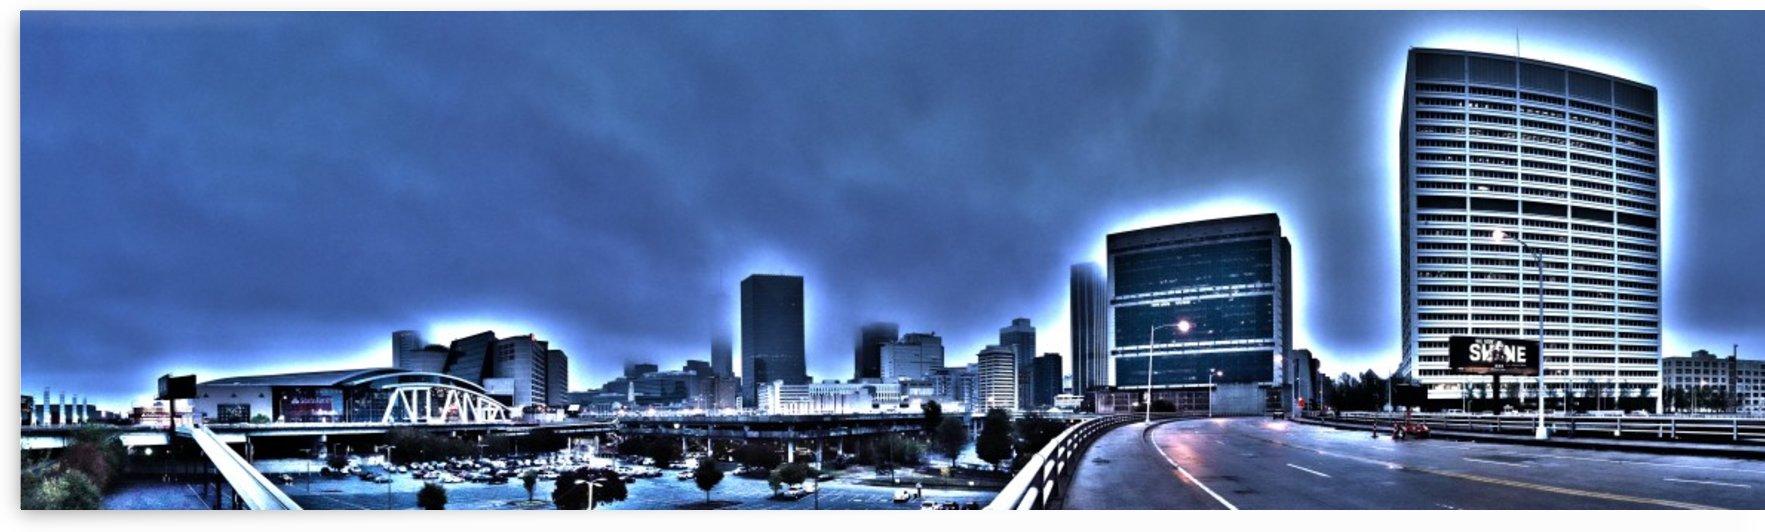 Surreal Atlanta by Jonathan Lee Becherer